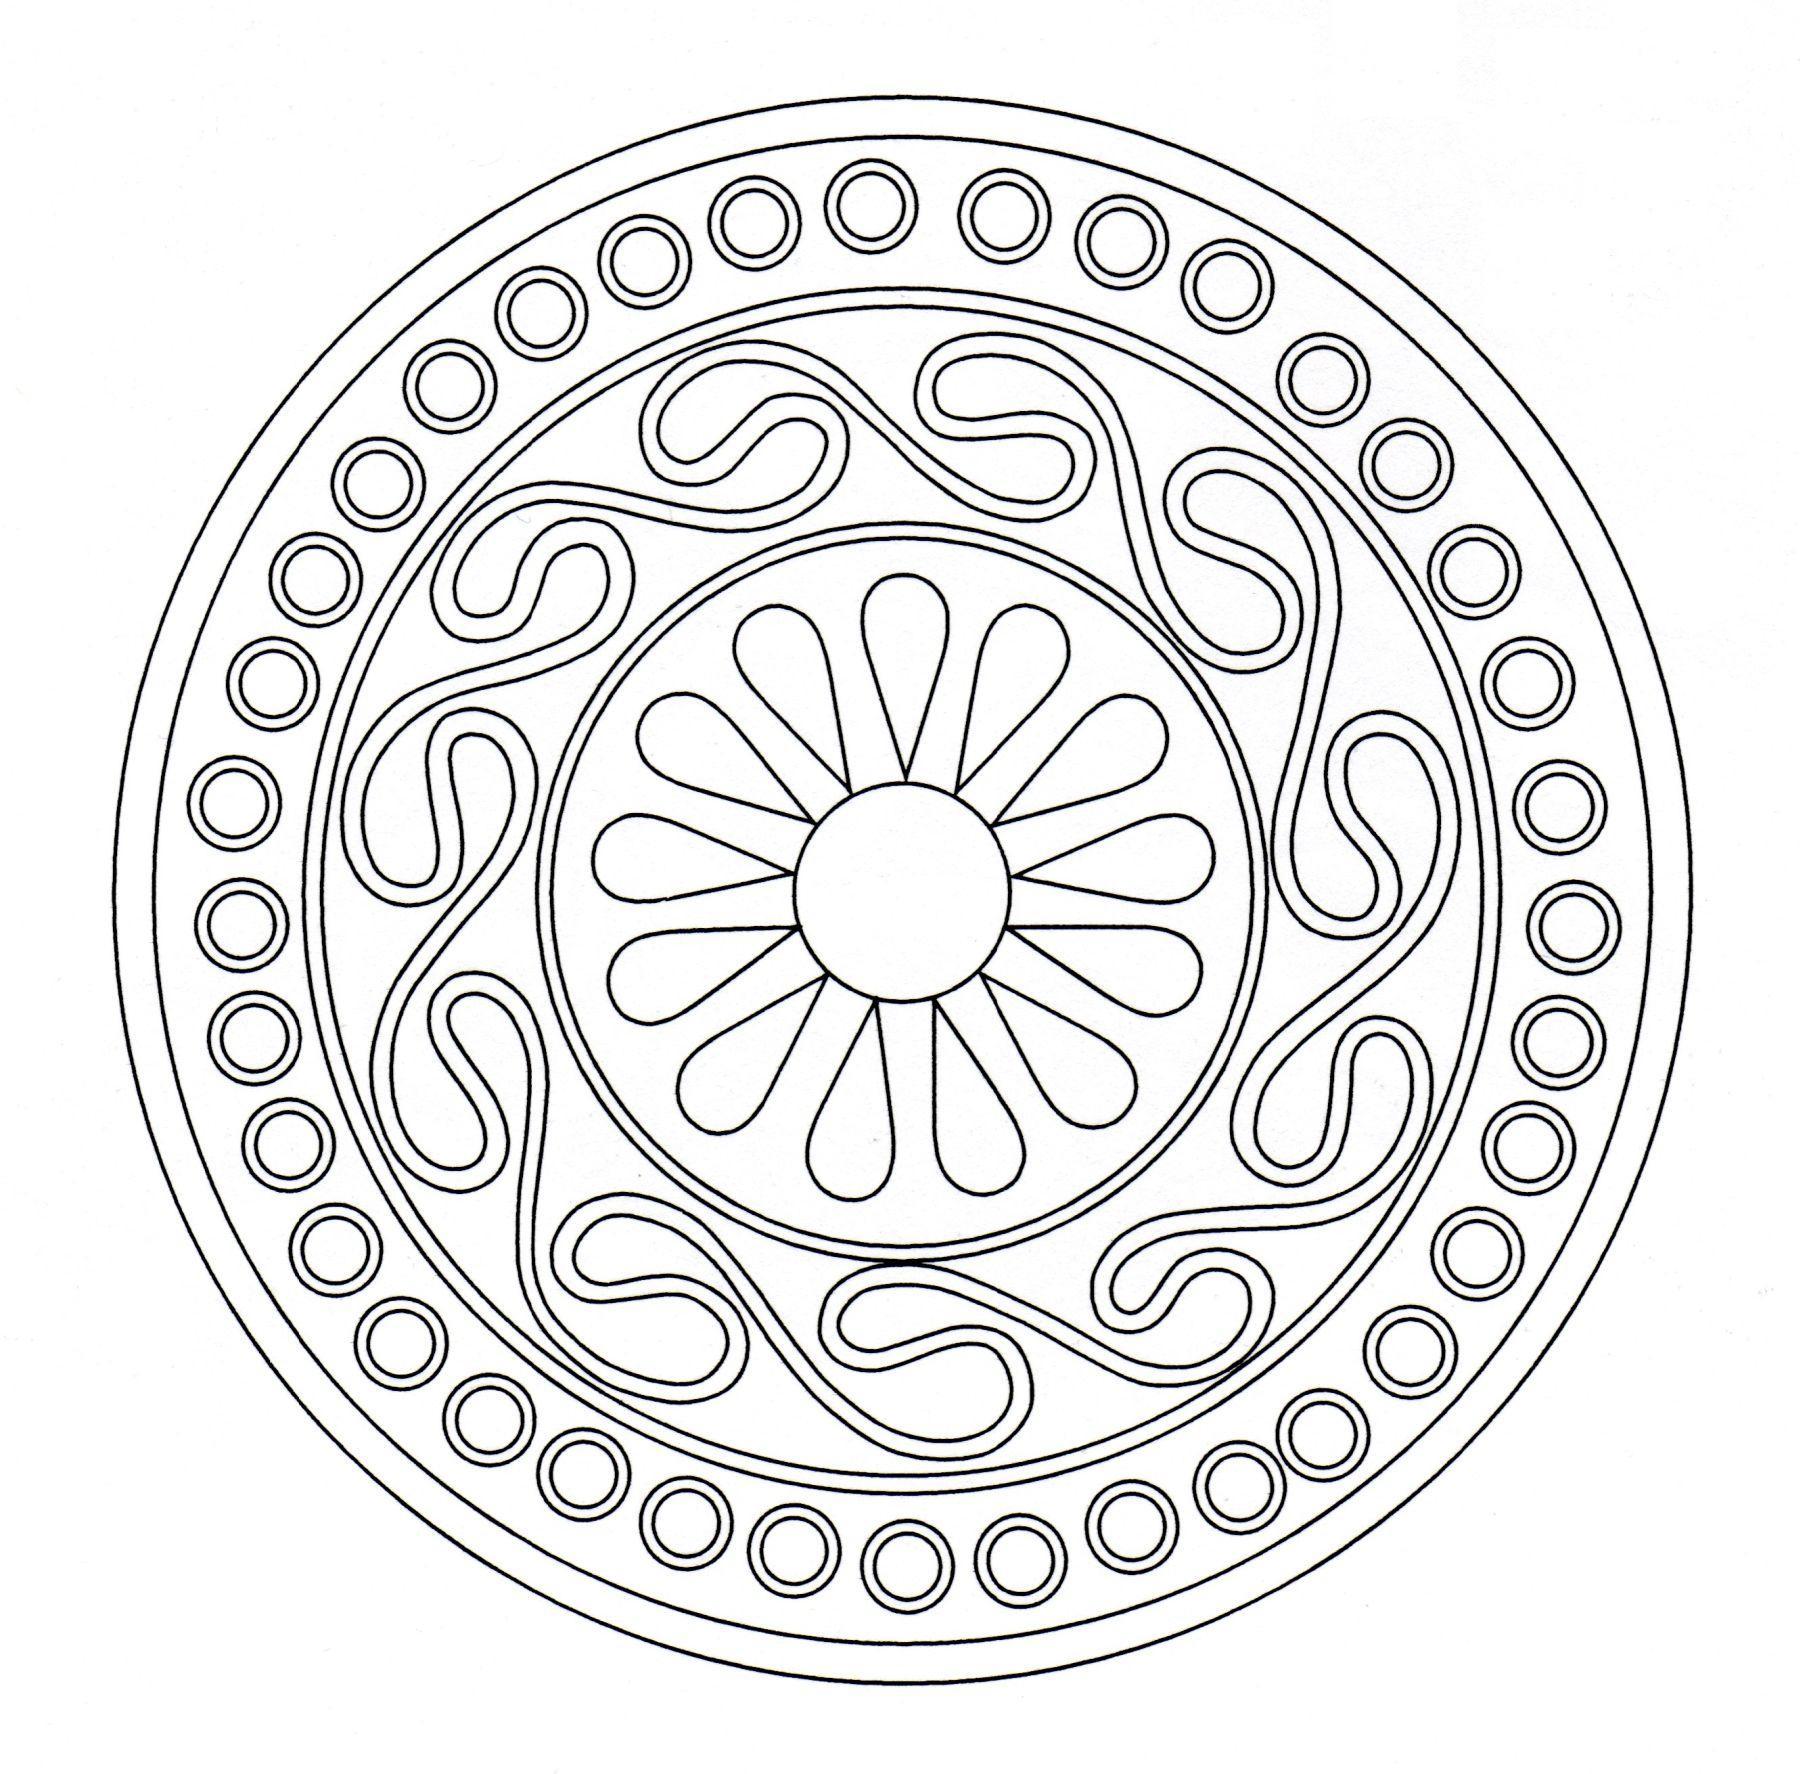 Celtic art drawing looking like a Mandala